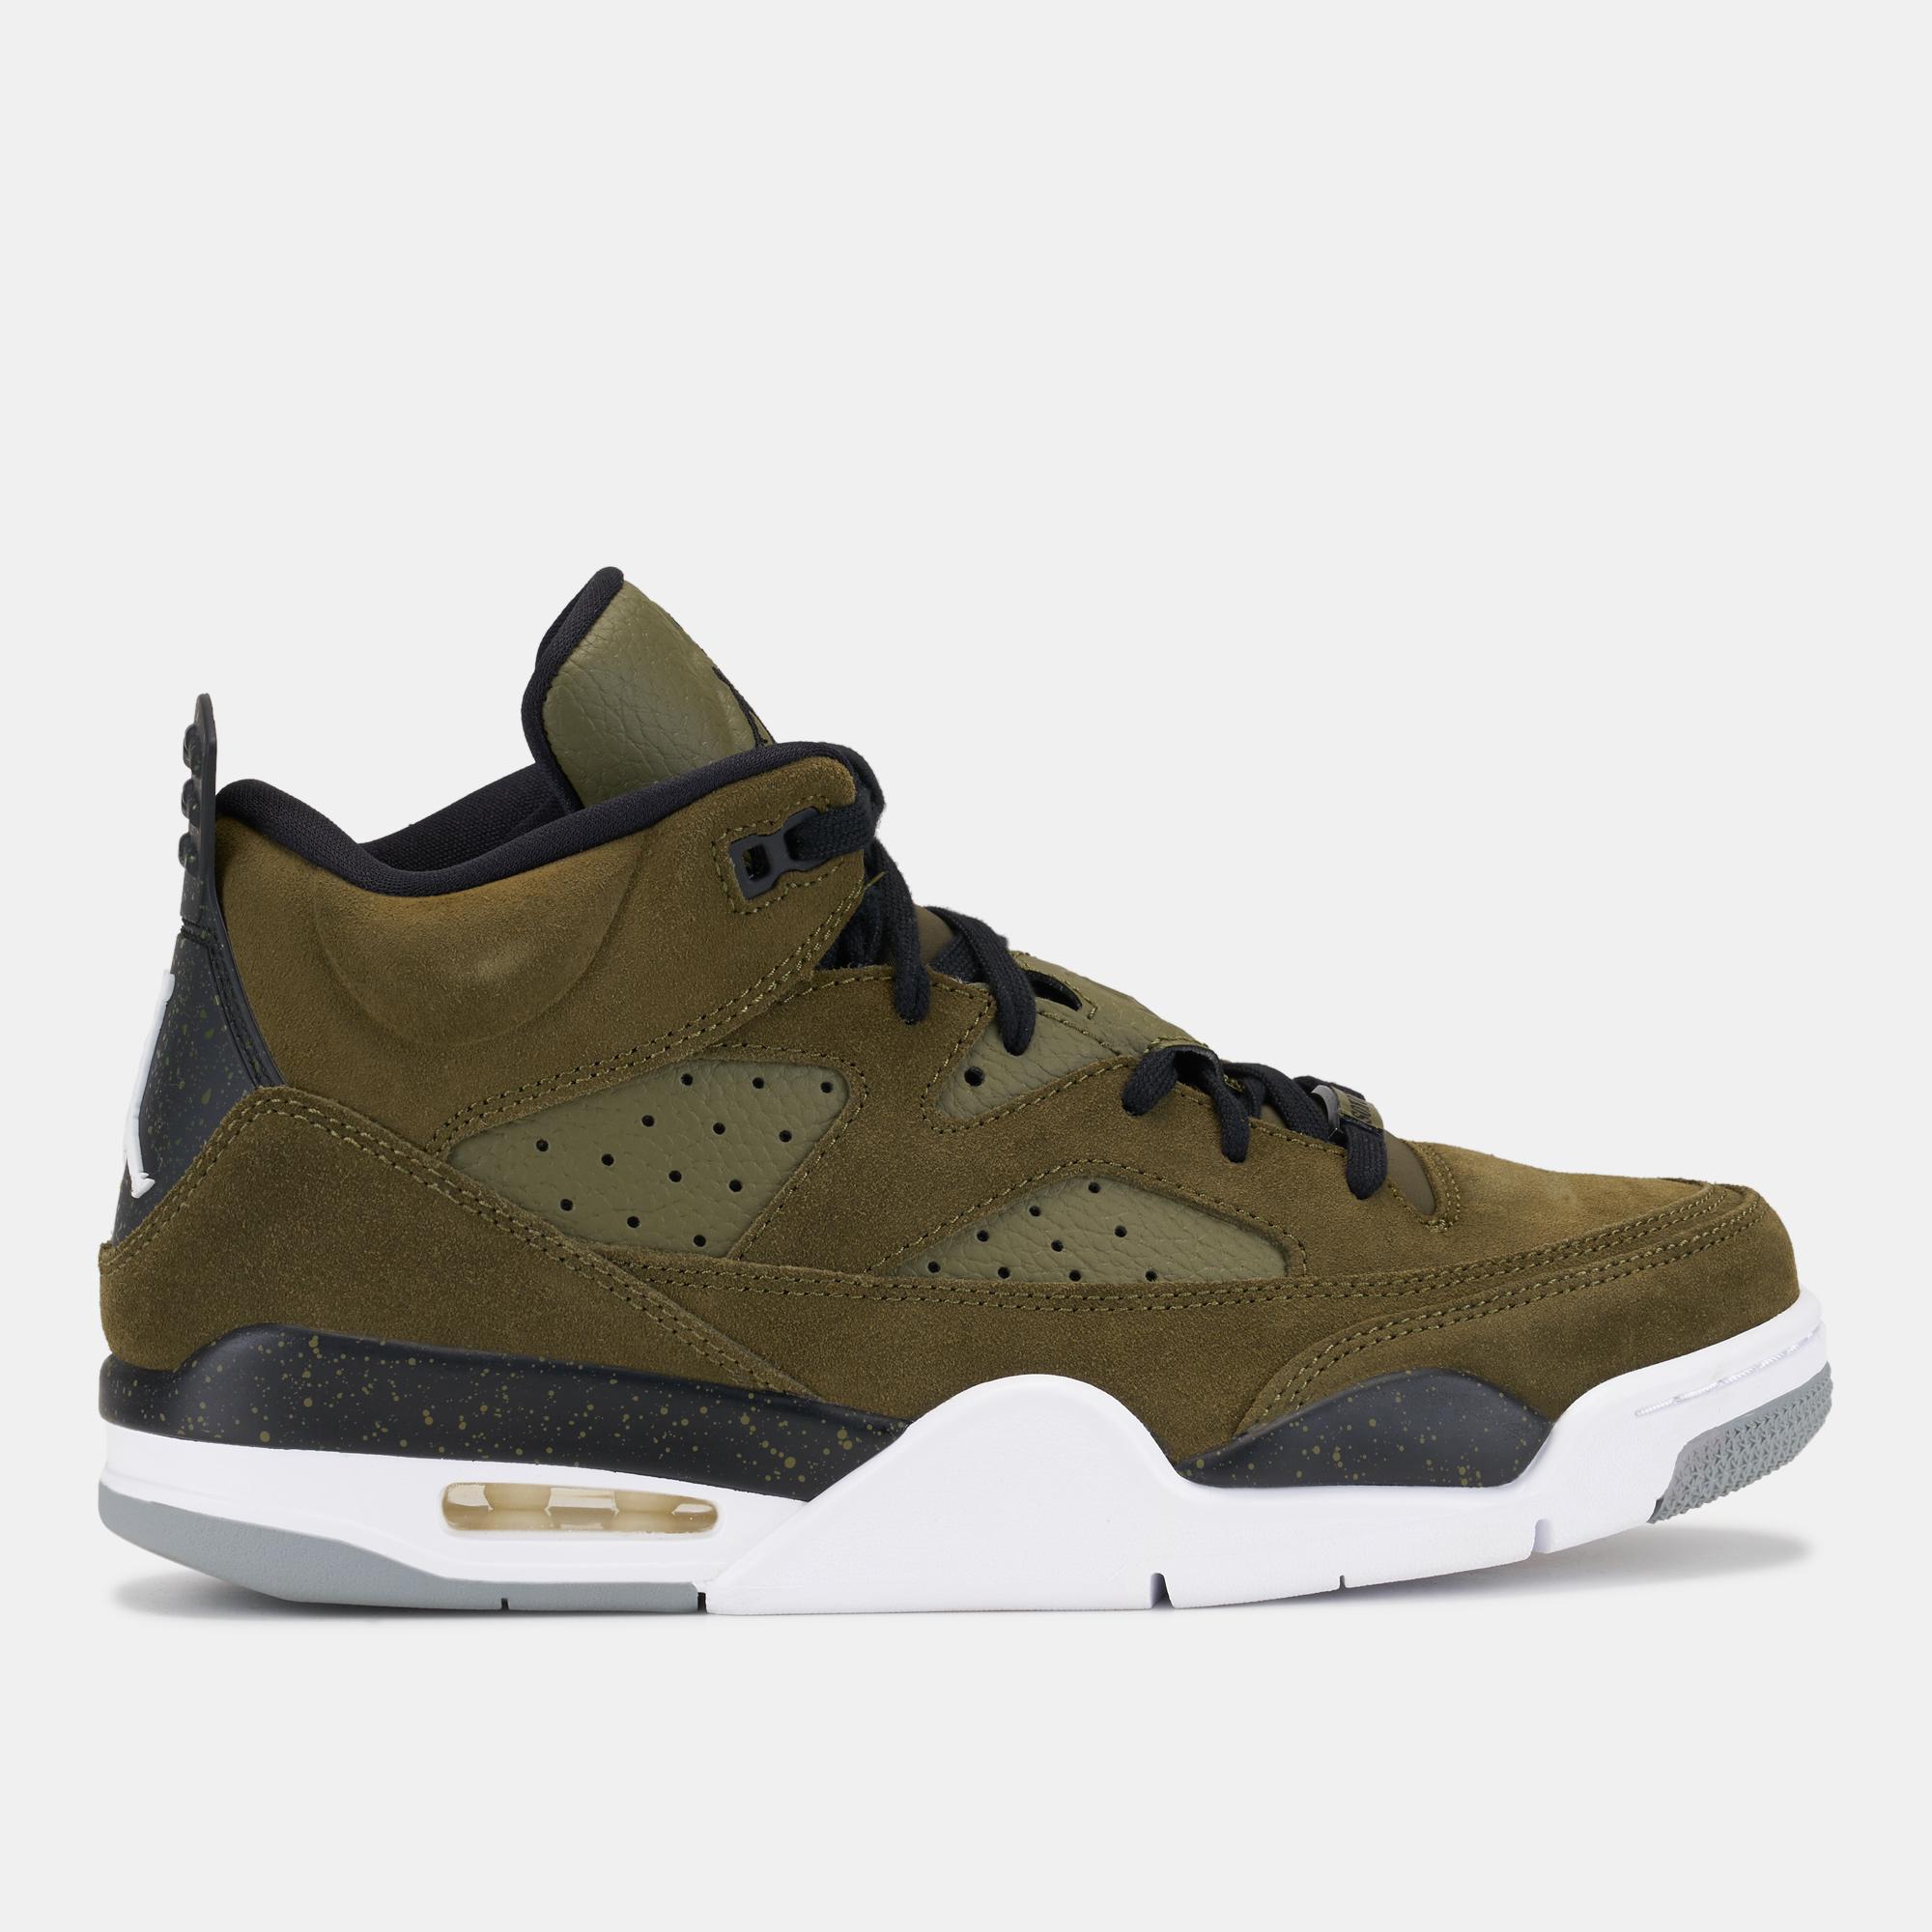 4a5efc2c5582 Jordan Son of Mars Low Shoe